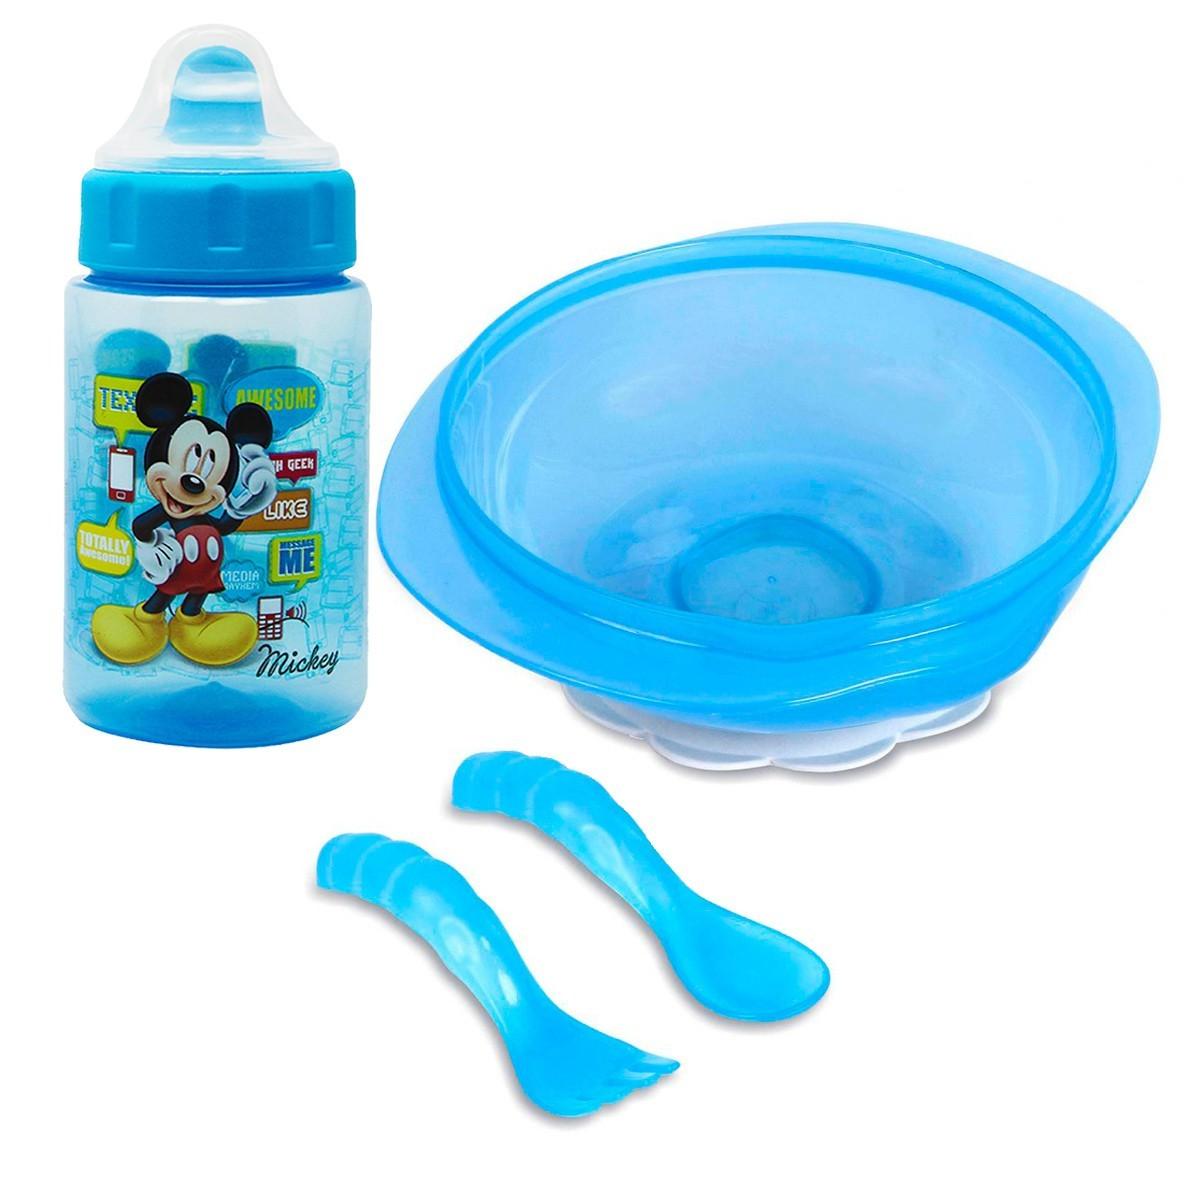 Kit Prato C/ Ventosa e Talheres + Copo C/ Redutor De Pingos Mickey Mouse